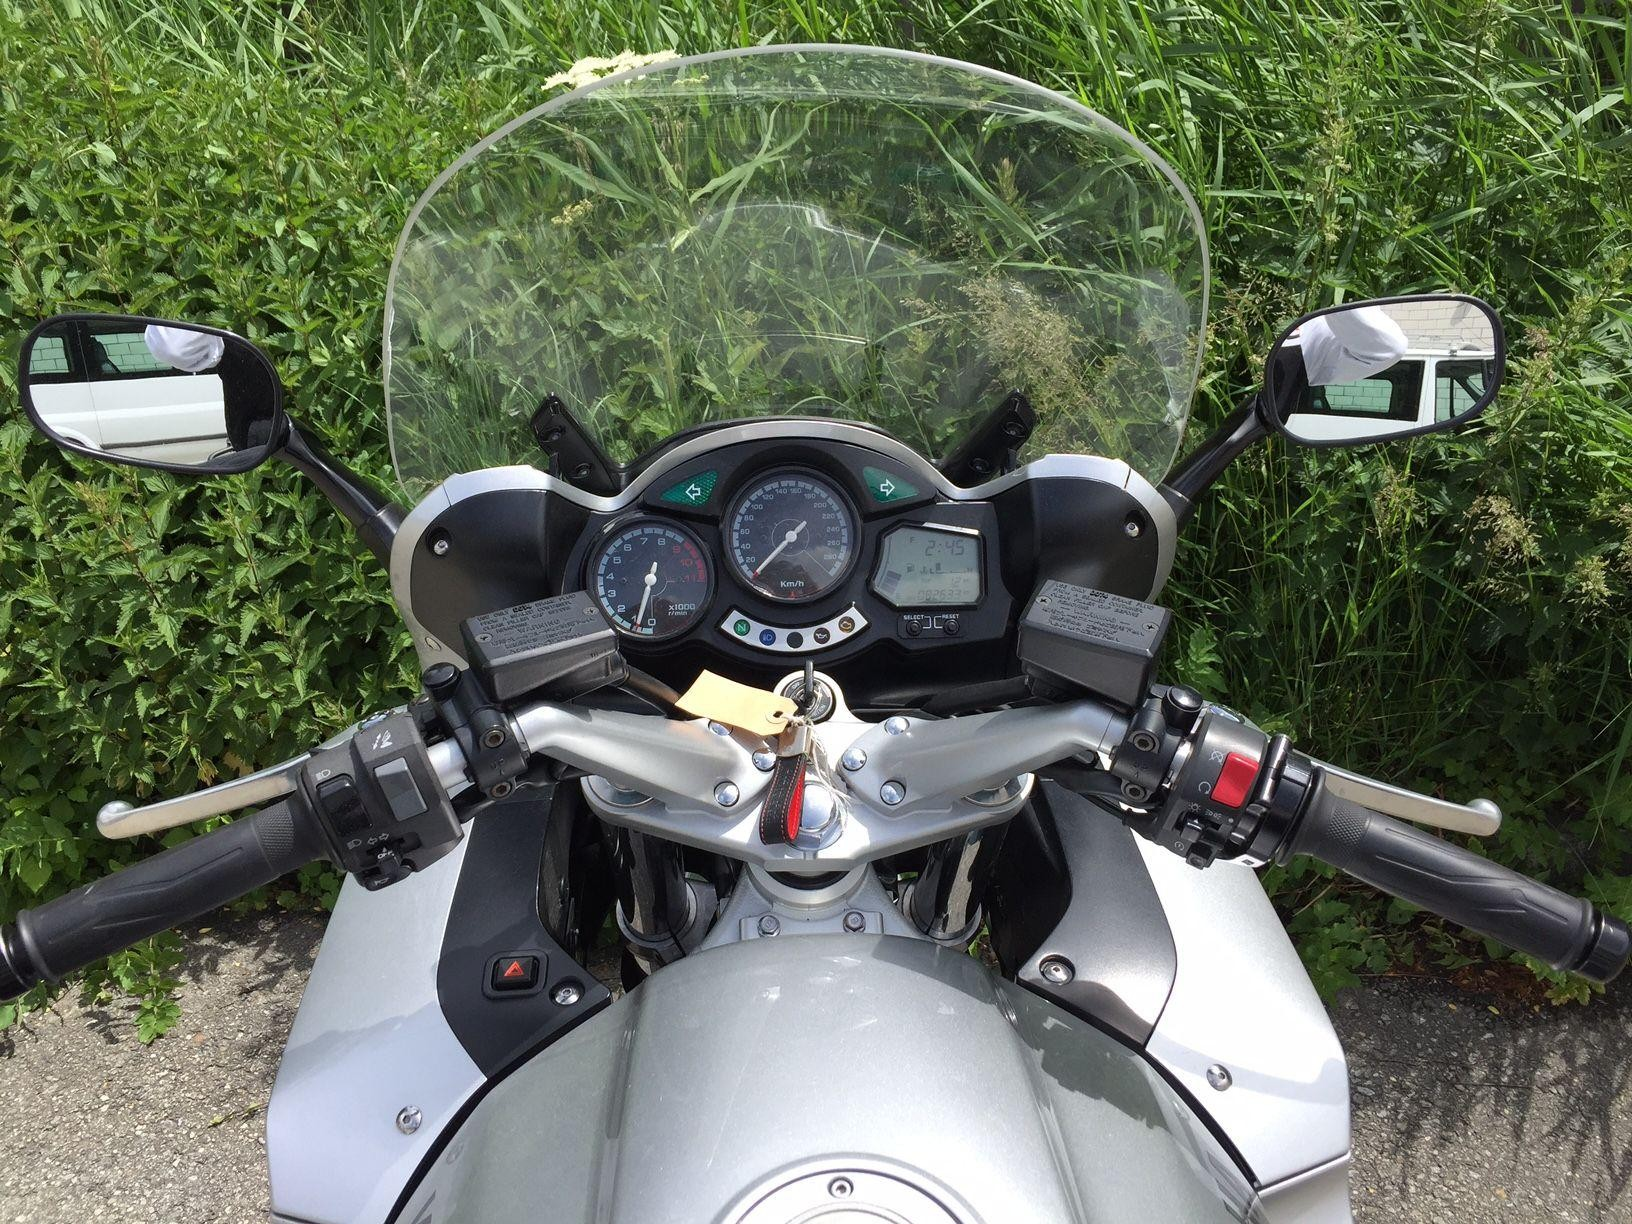 motorrad occasion kaufen yamaha fjr 1300 b renfaller moto. Black Bedroom Furniture Sets. Home Design Ideas